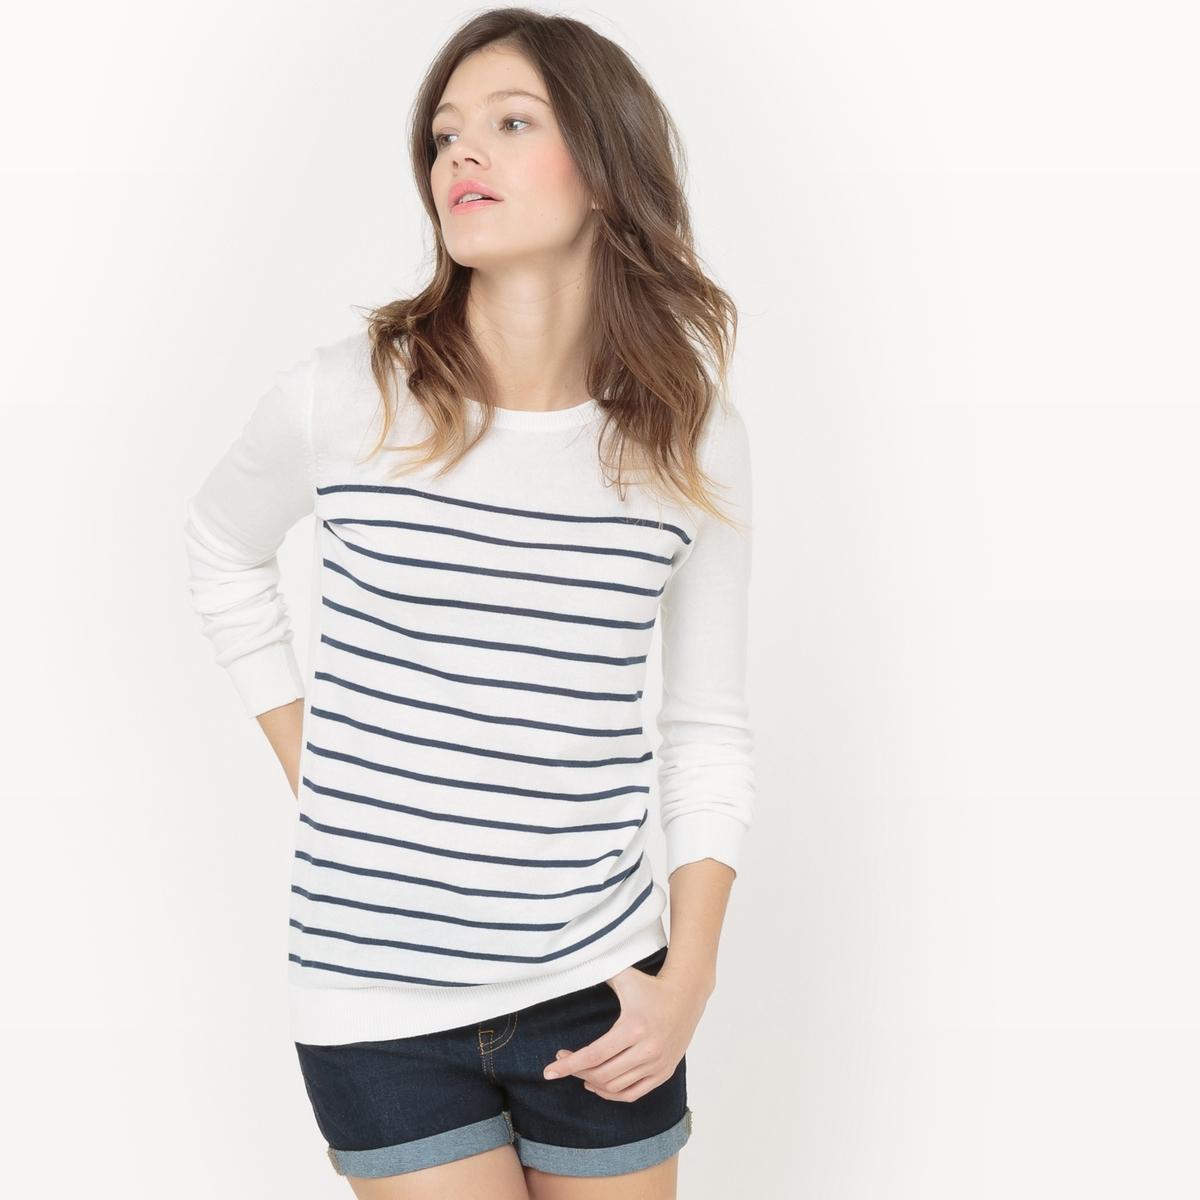 Пуловер с круглым вырезом из хлопка пуловер с круглым вырезом из хлопка и льна